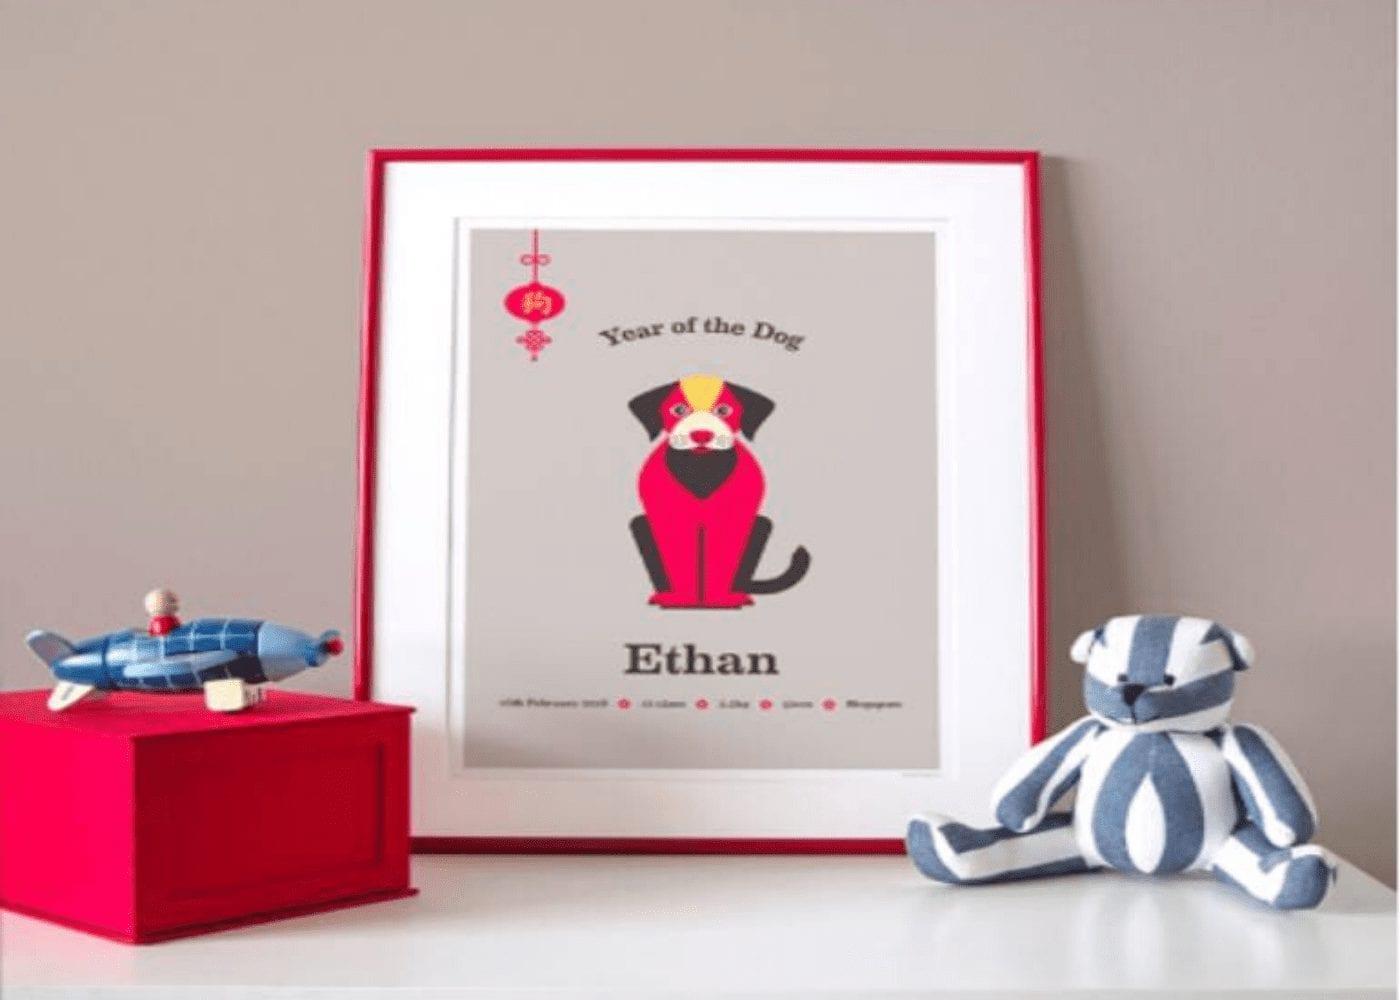 a print of a pug as part of a chinese zodiac artwork